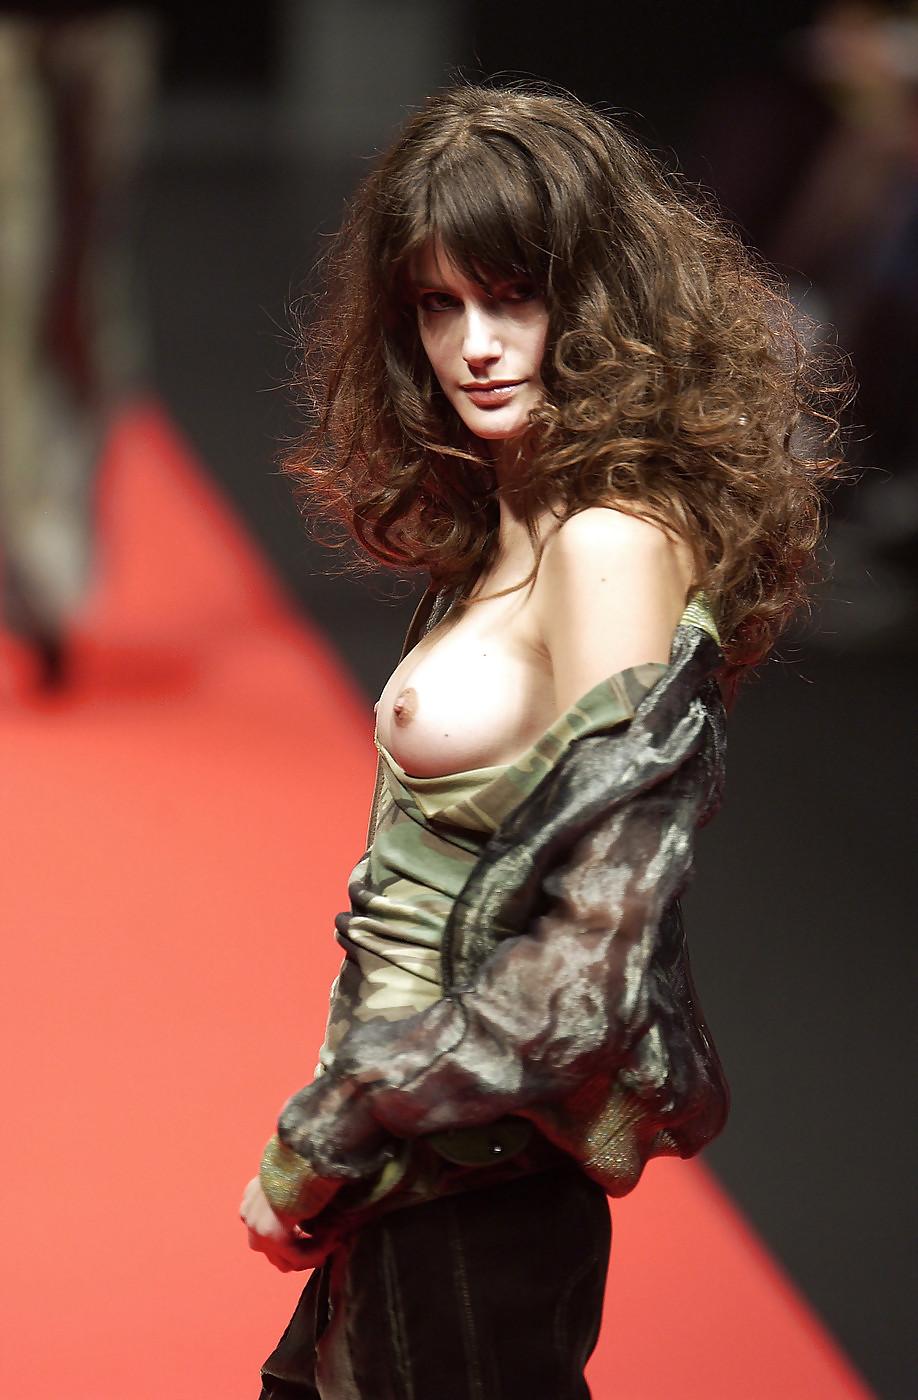 Model walked milan fashion week catwalk with three boobs